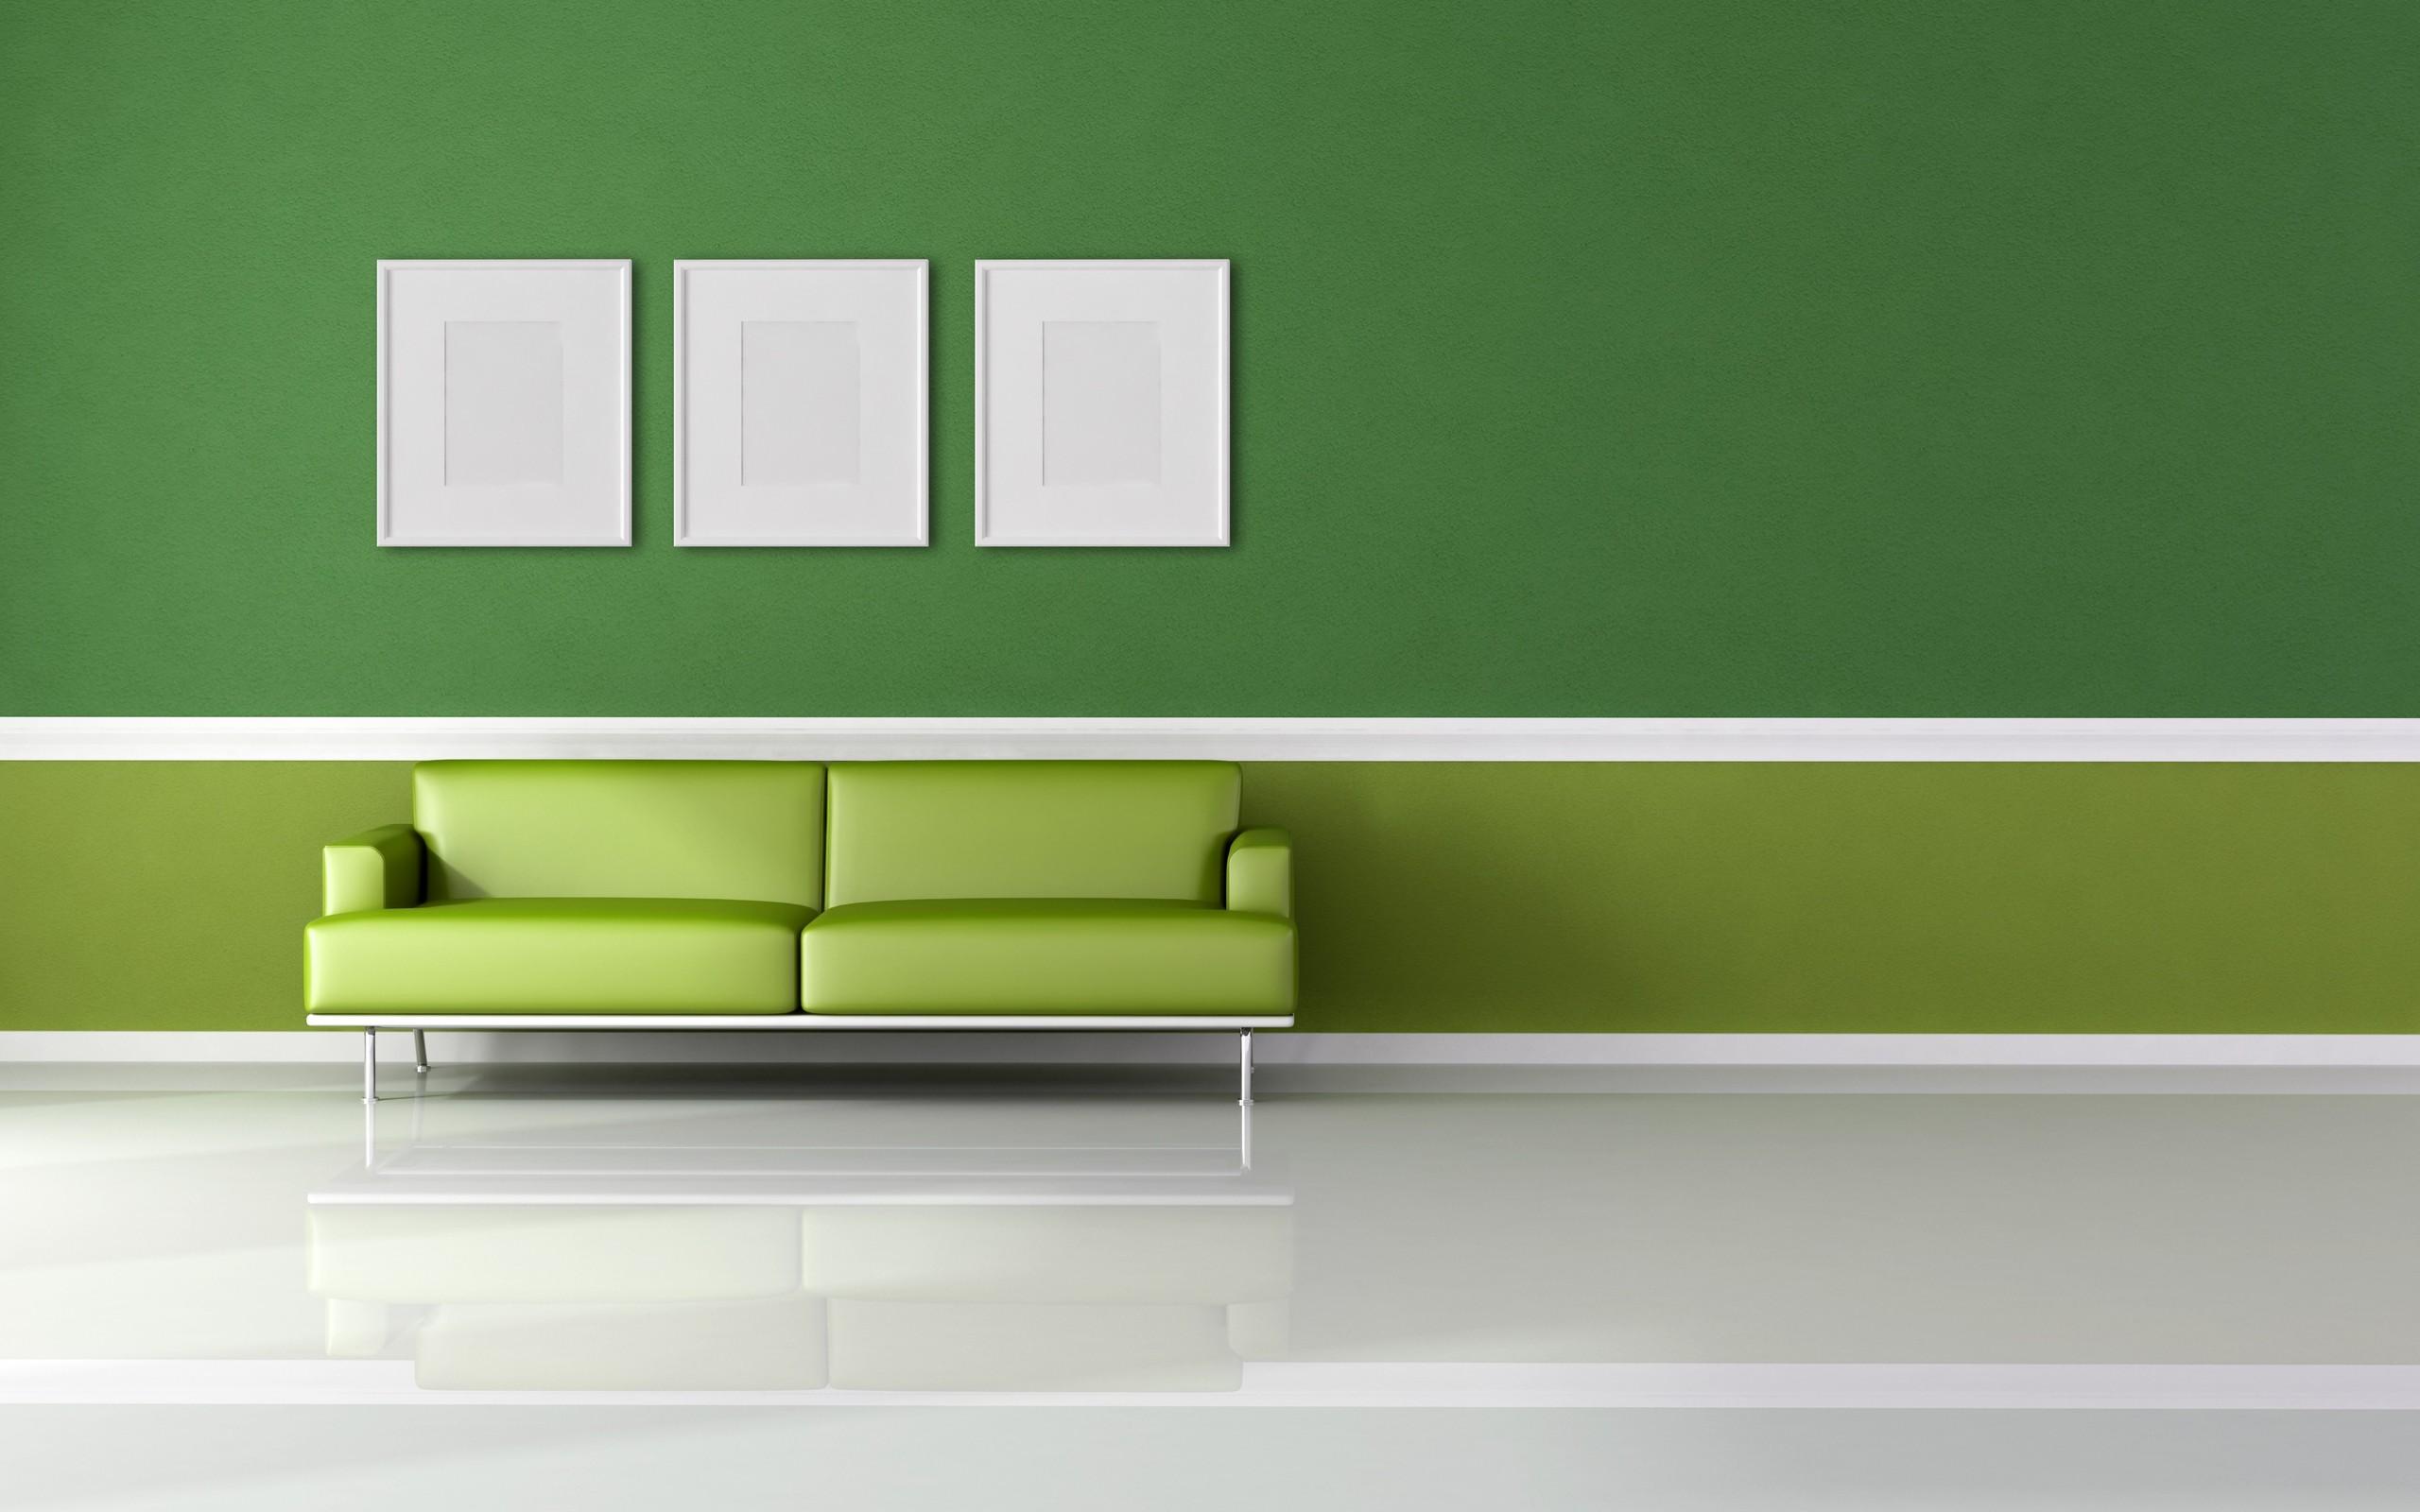 furniture computer wallpapers desktop - photo #31